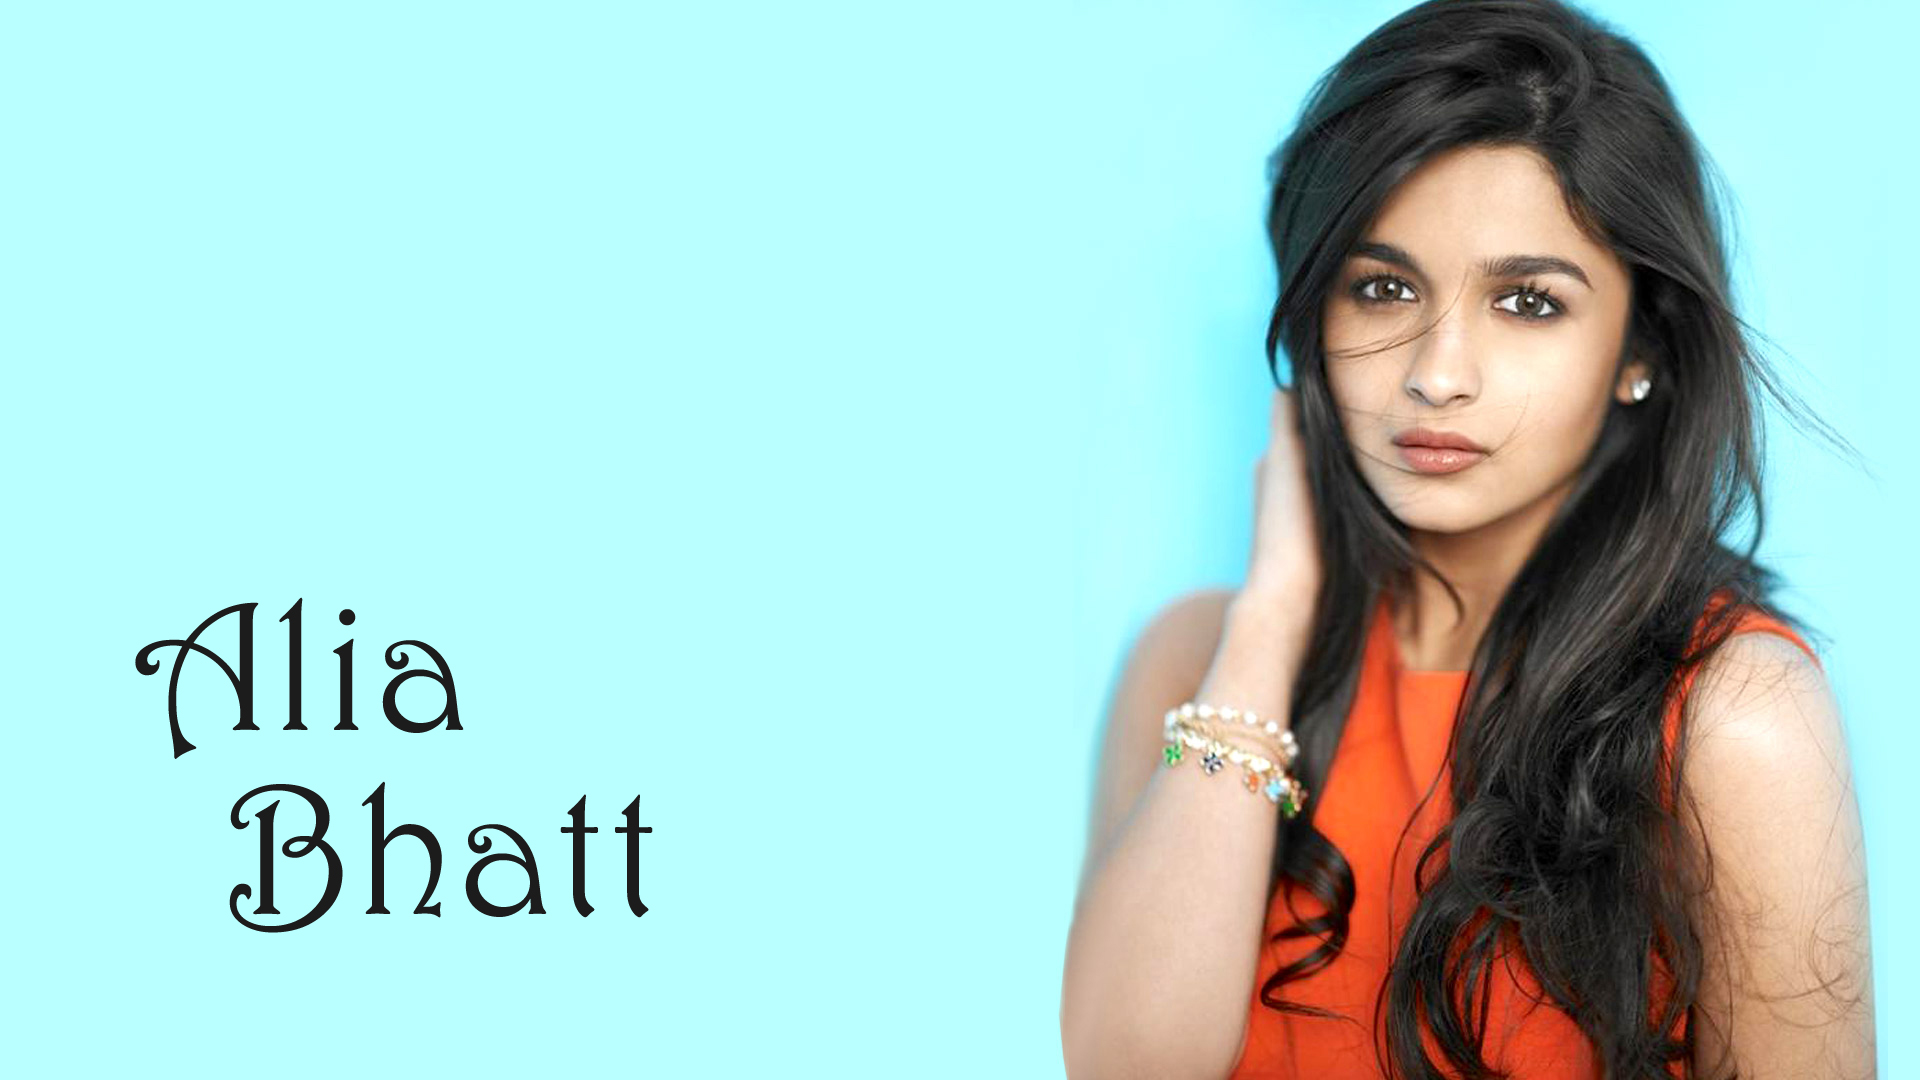 Alia Bhatt 2016 Wallpapers: Alia Bhatt Wallpapers High Quality